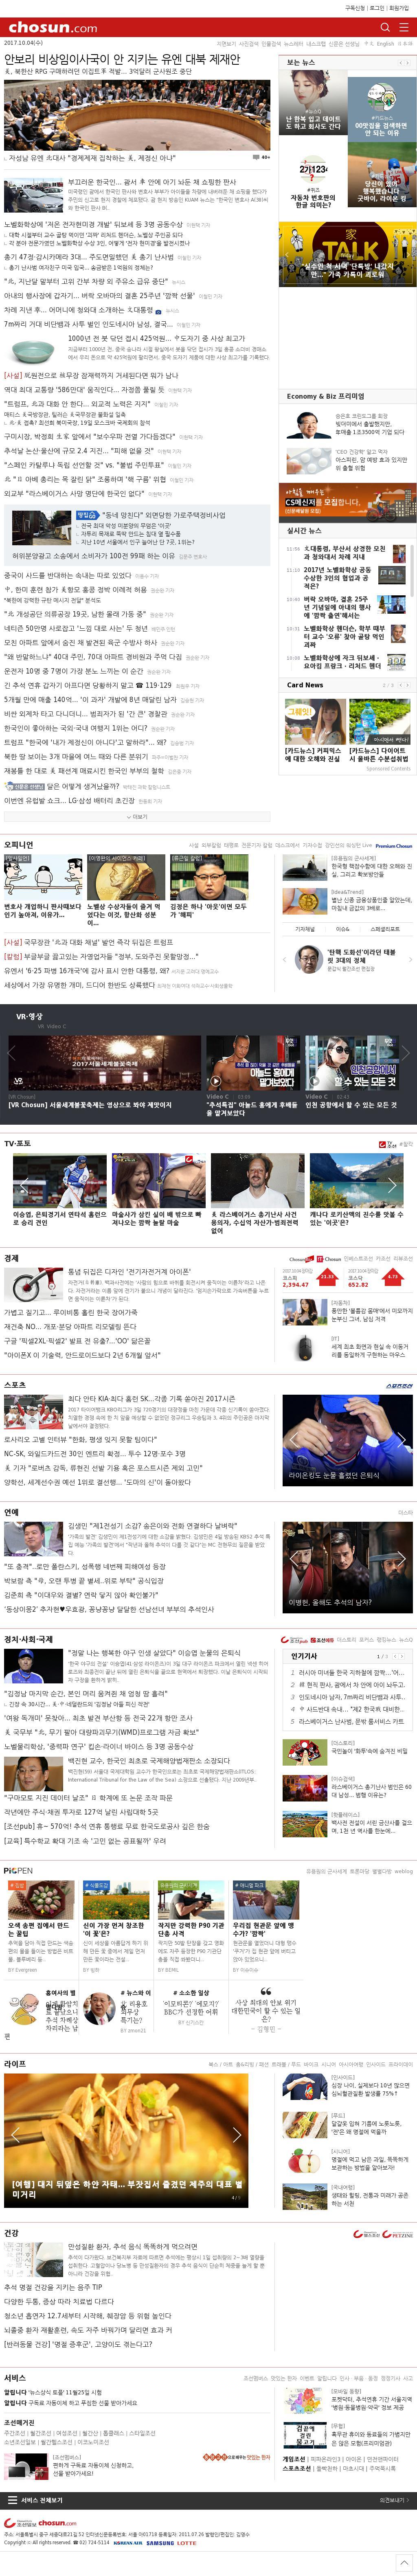 chosun.com at Wednesday Oct. 4, 2017, 12:02 p.m. UTC